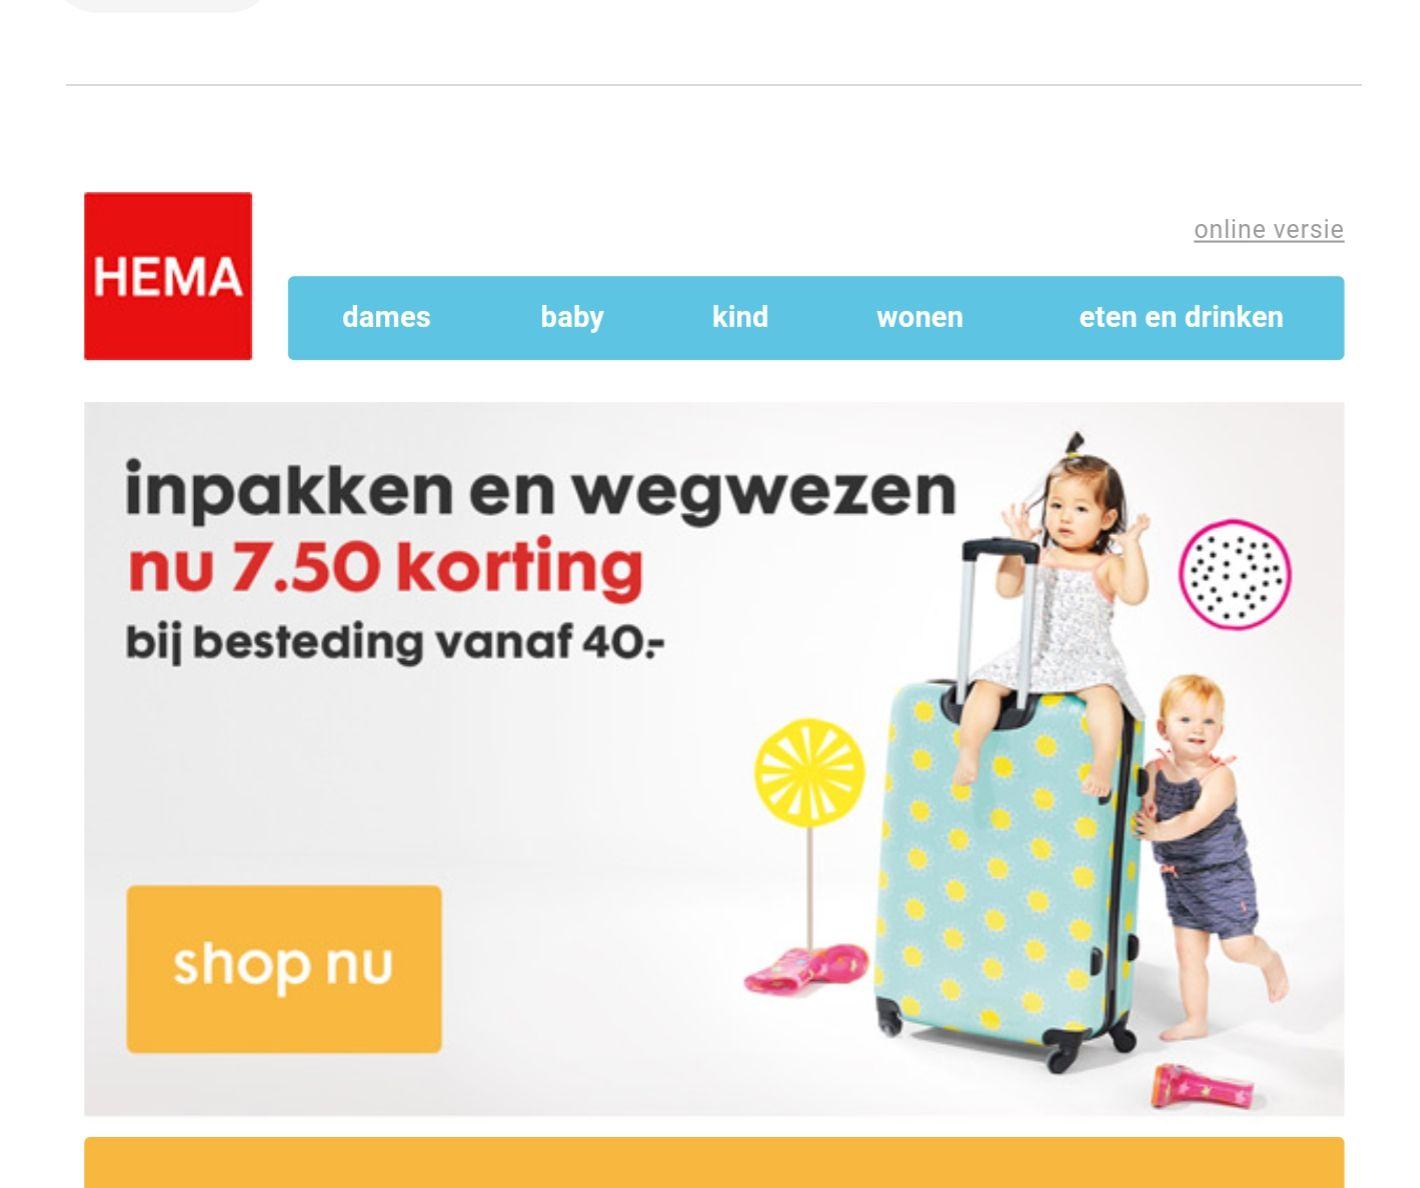 HEMA €7,50 korting bij besteding vanaf €40,-